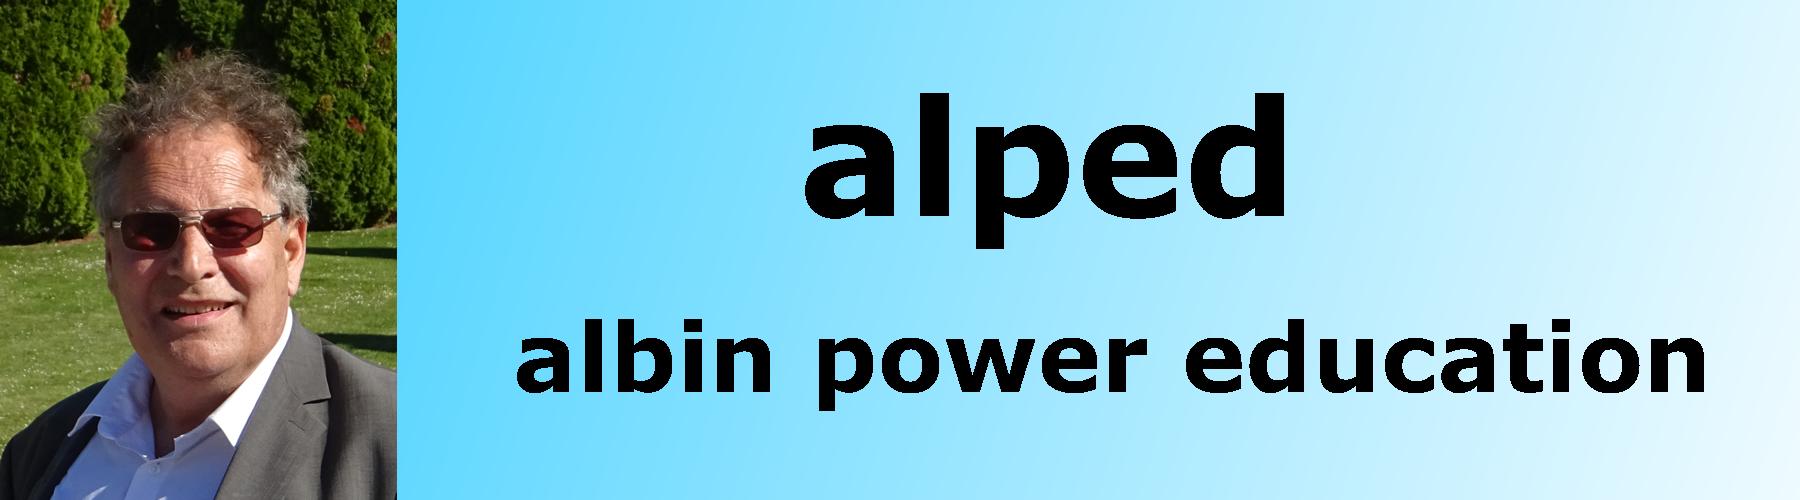 alped